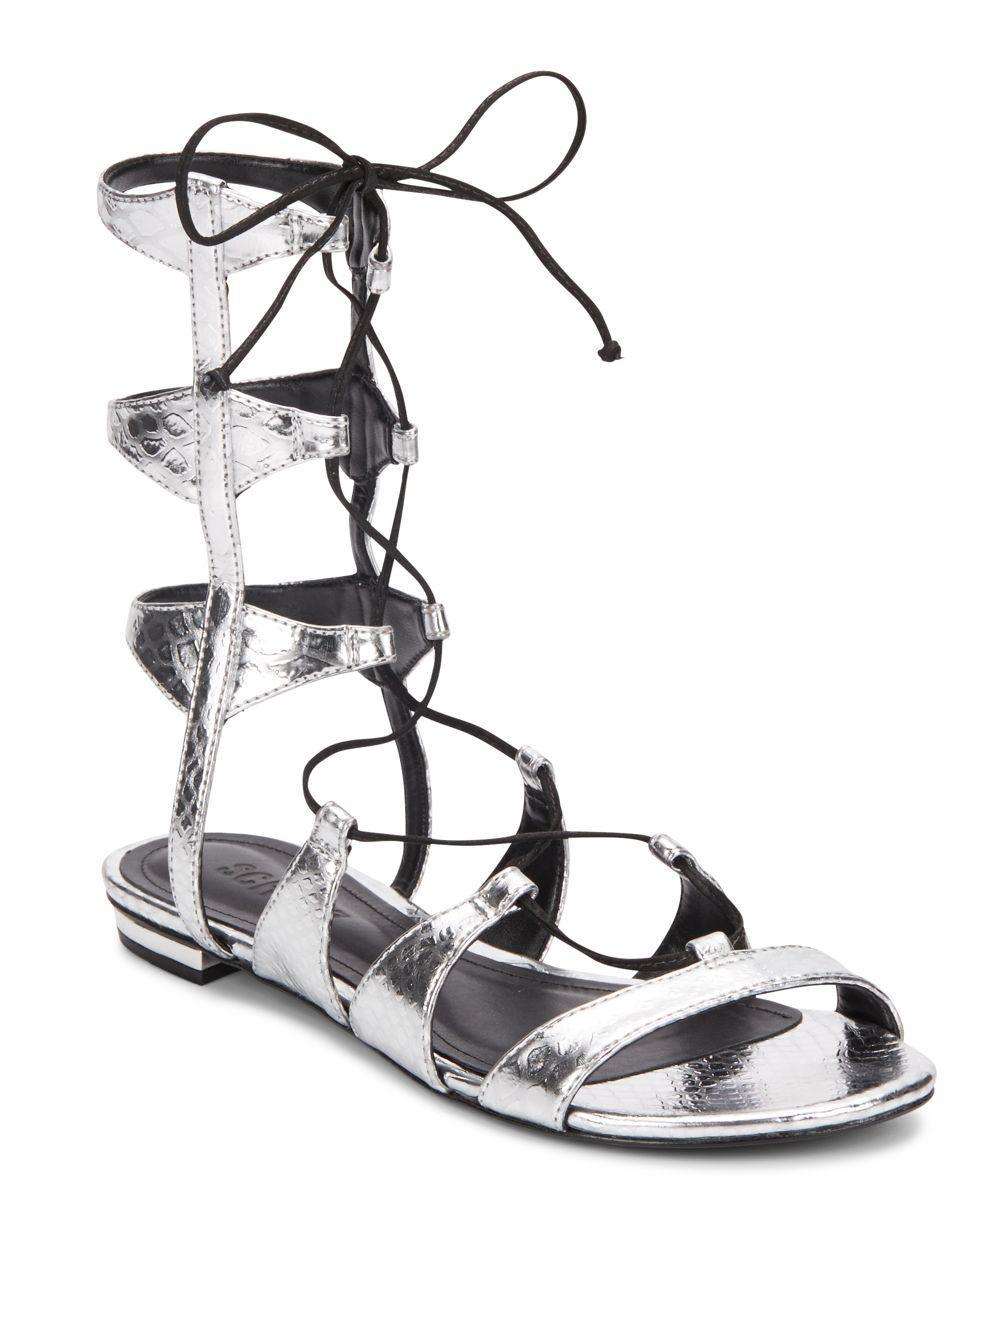 3f82cc4e0be6 Lyst - Schutz Erlina Metallic Gladiator Sandals in Black